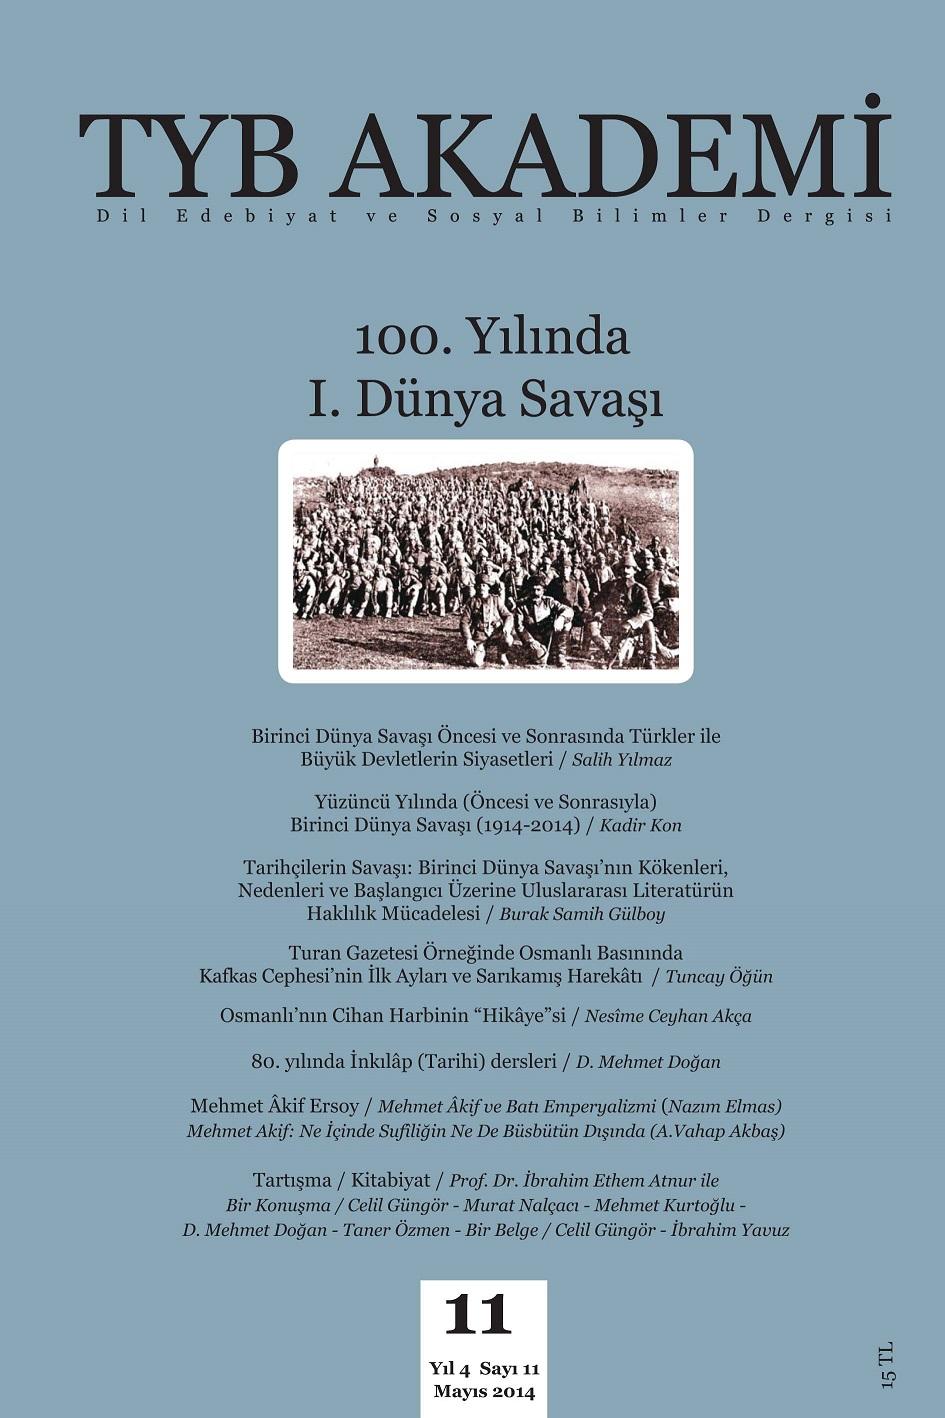 TYB Akademi 11: 100. Yılında 1. Dünya Savaşı